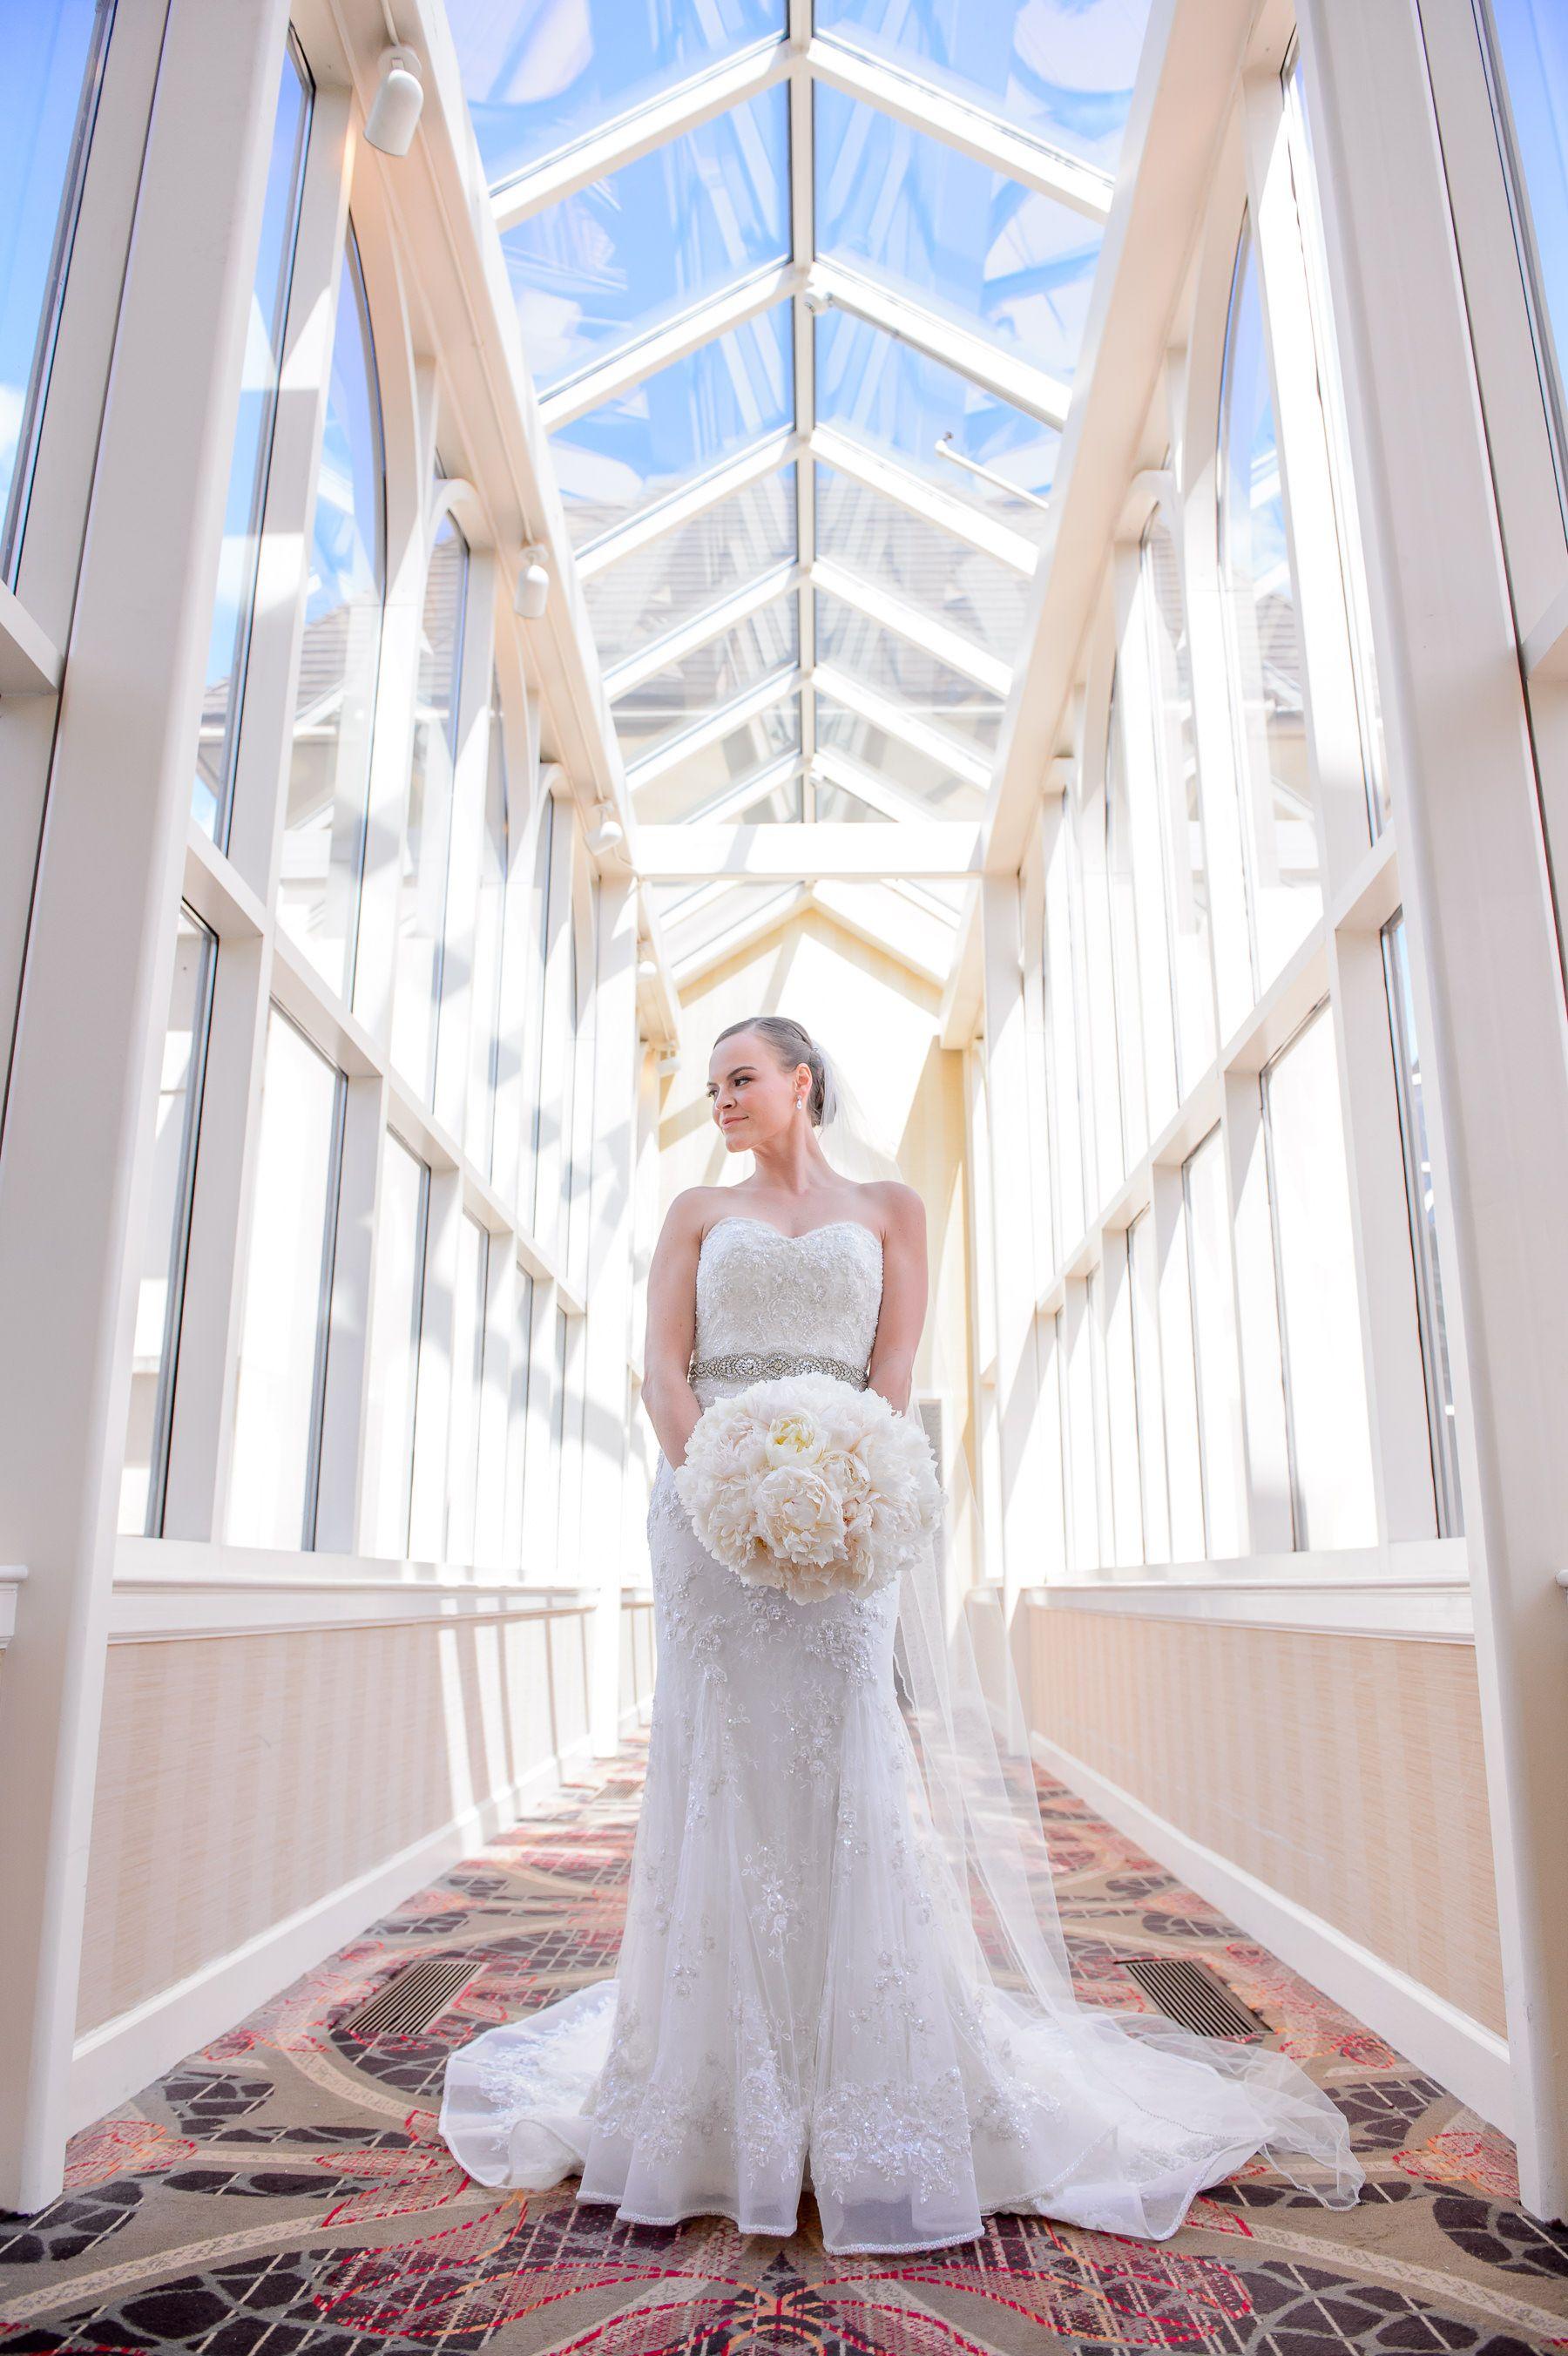 Cleopatra Unique Lace Mermaid Wedding Dress Coupled With Unique Pearl Encrusted Neckline Wedding Dresses Perth Wedding Dresses Atlanta European Wedding Dresses [ 1125 x 750 Pixel ]